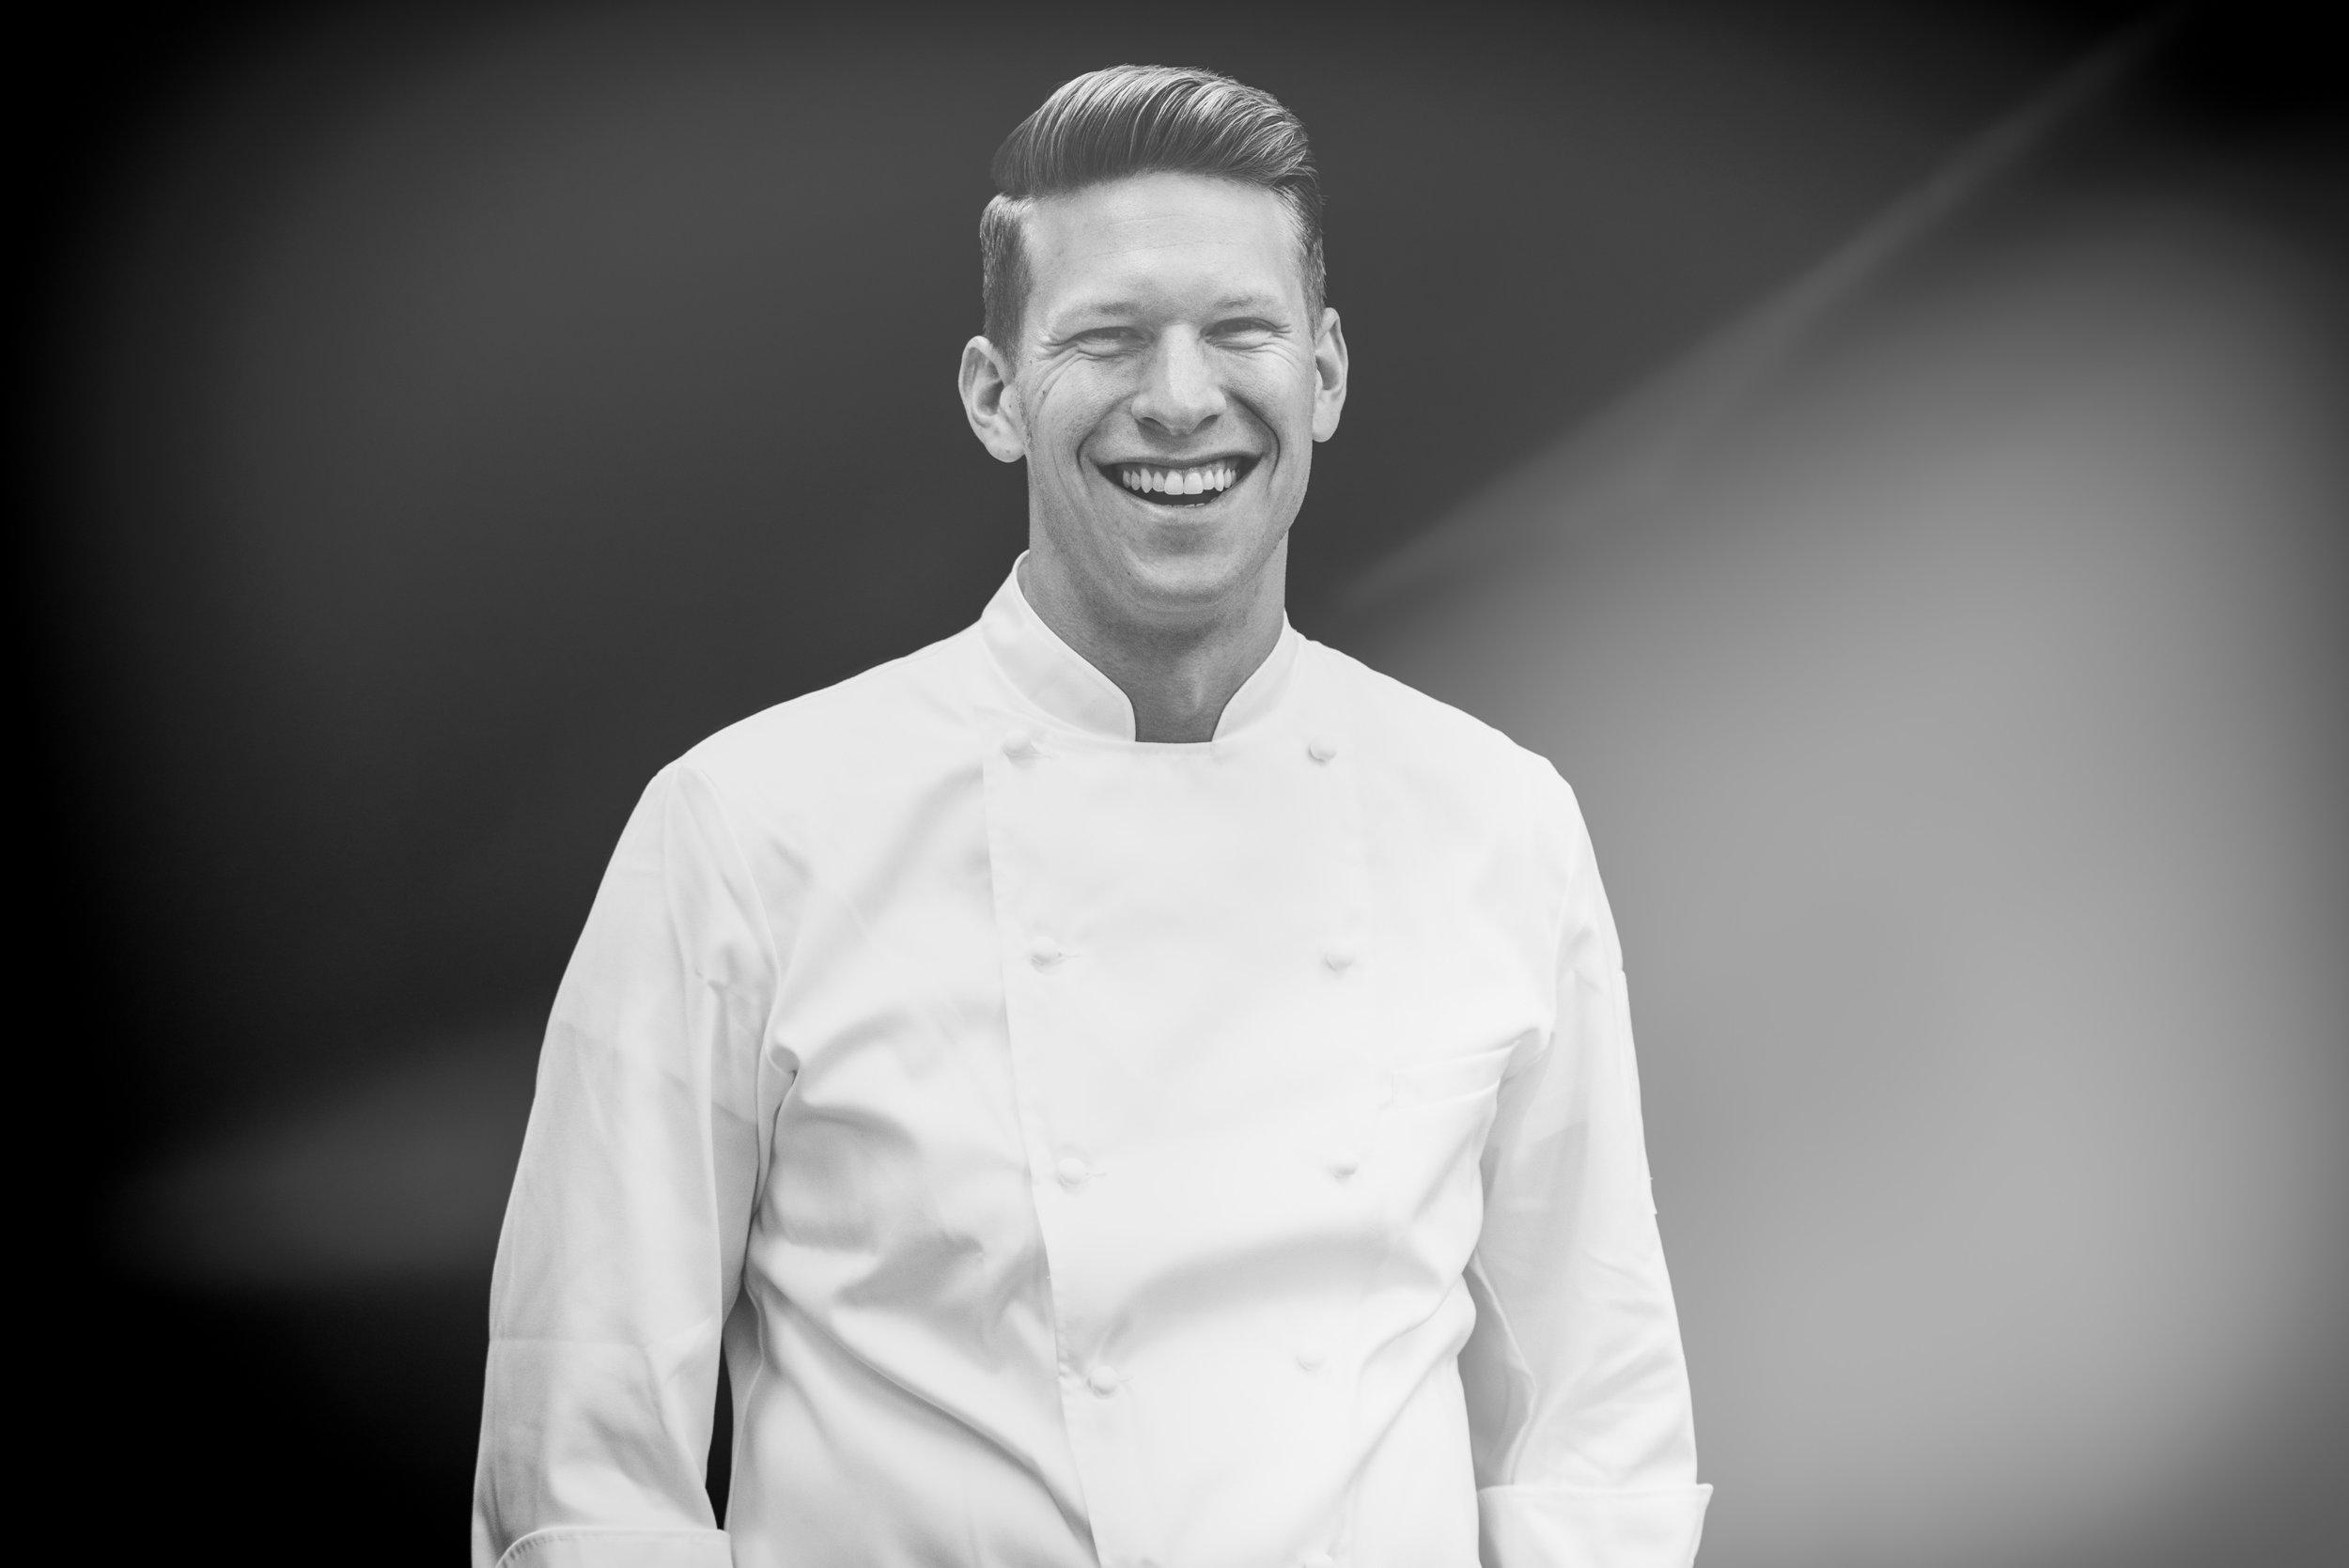 BTTAGS x Chef Brandon Rosen BW-.jpg